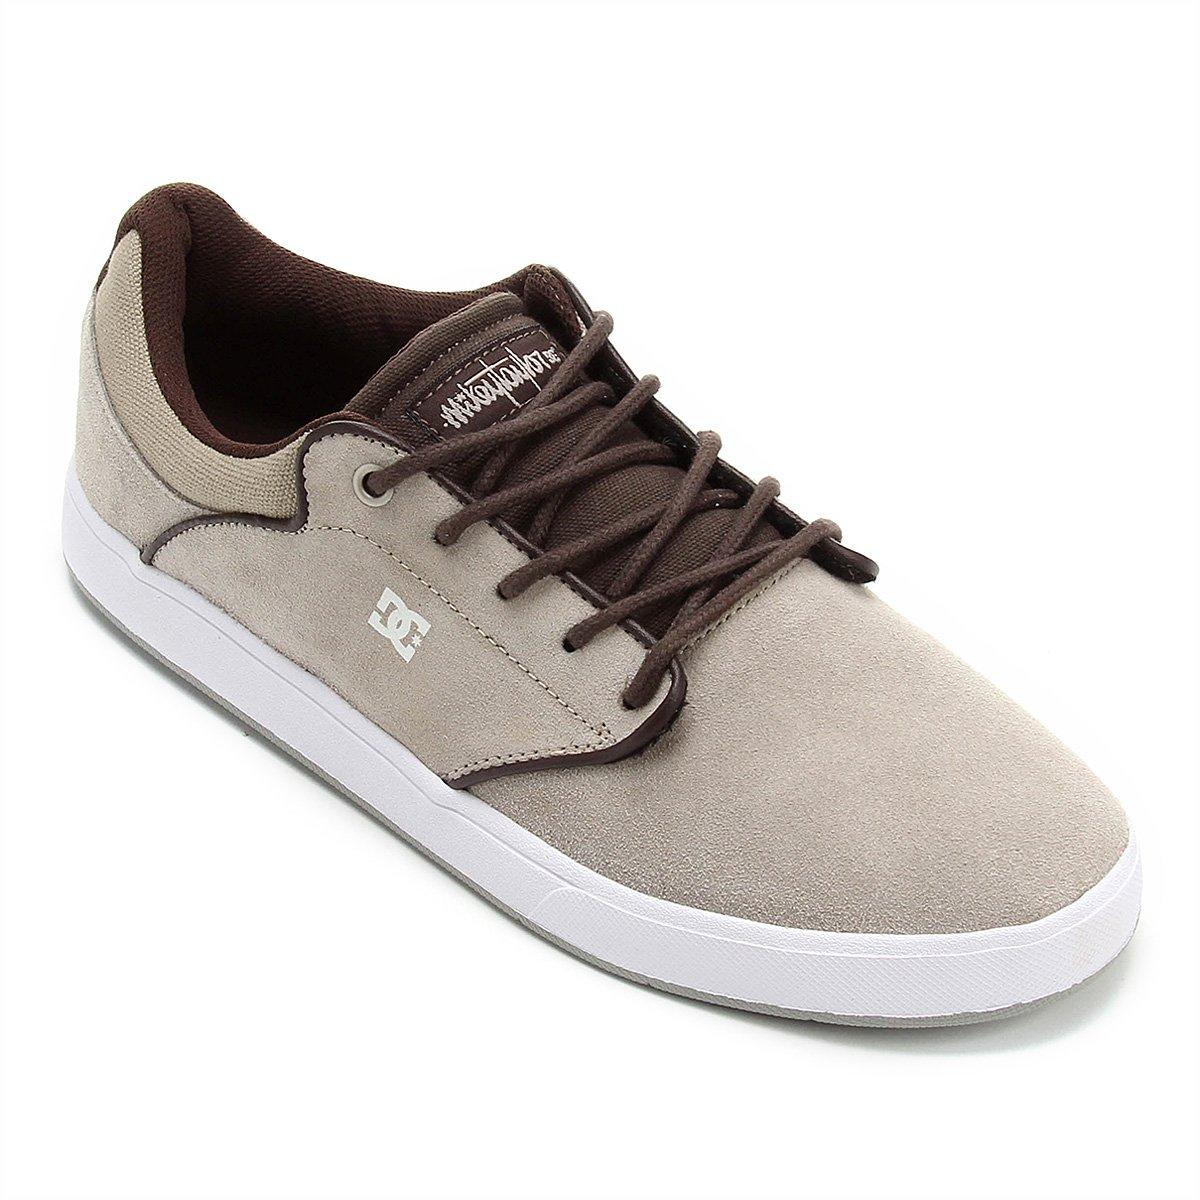 454ad875a71 Tênis DC Shoes Mikey Taylor S - Compre Agora